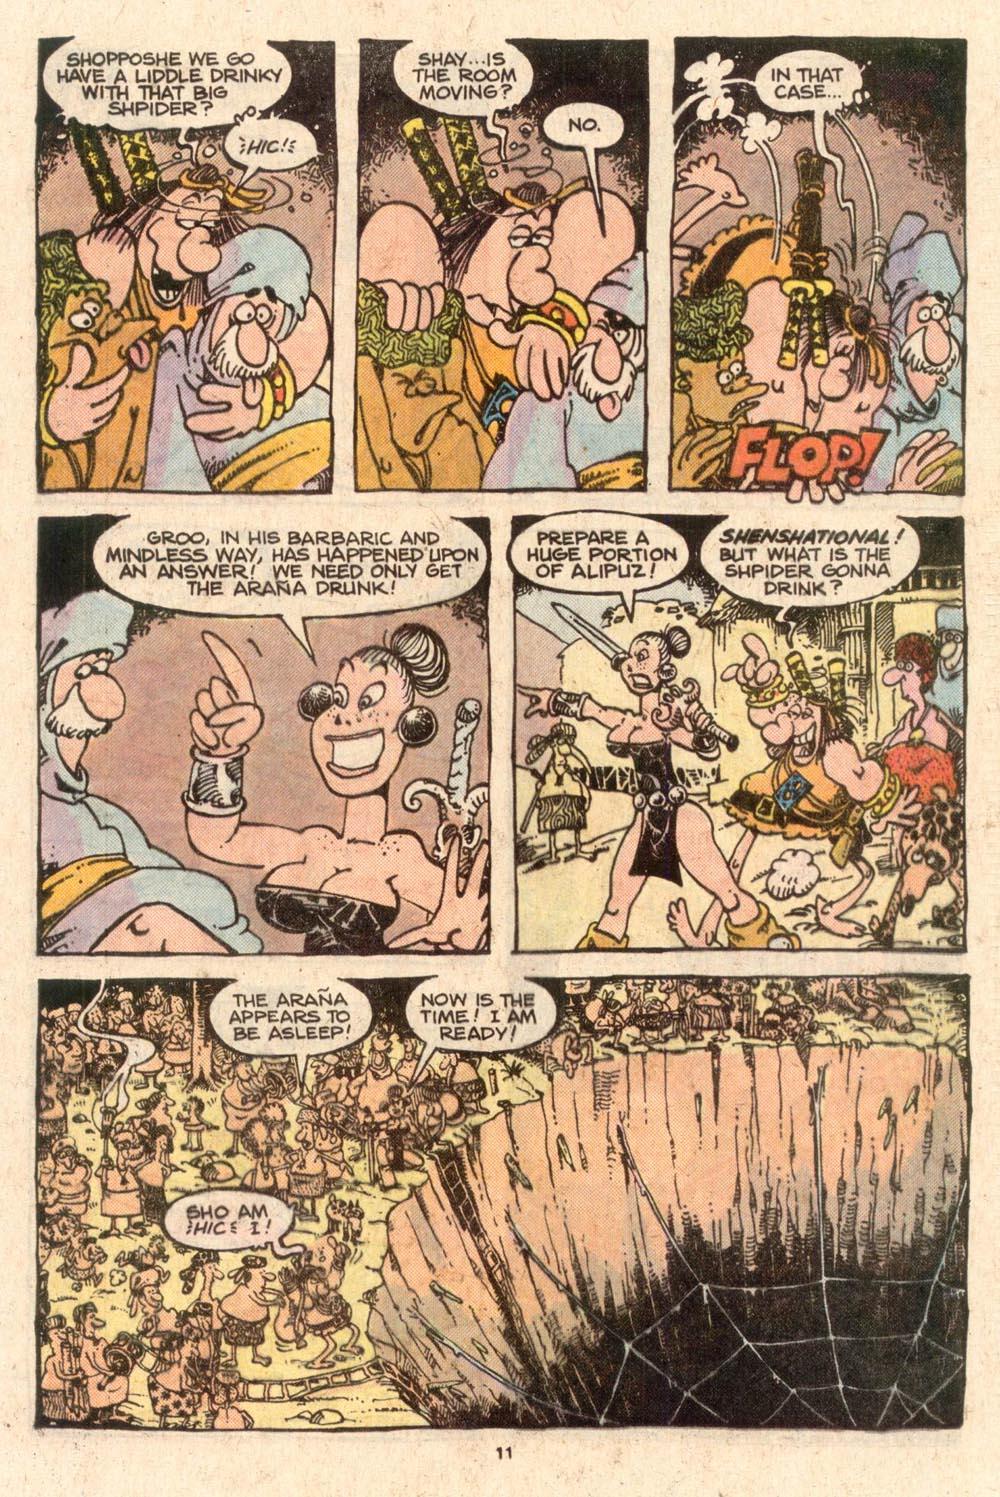 Read online Sergio Aragonés Groo the Wanderer comic -  Issue #52 - 11